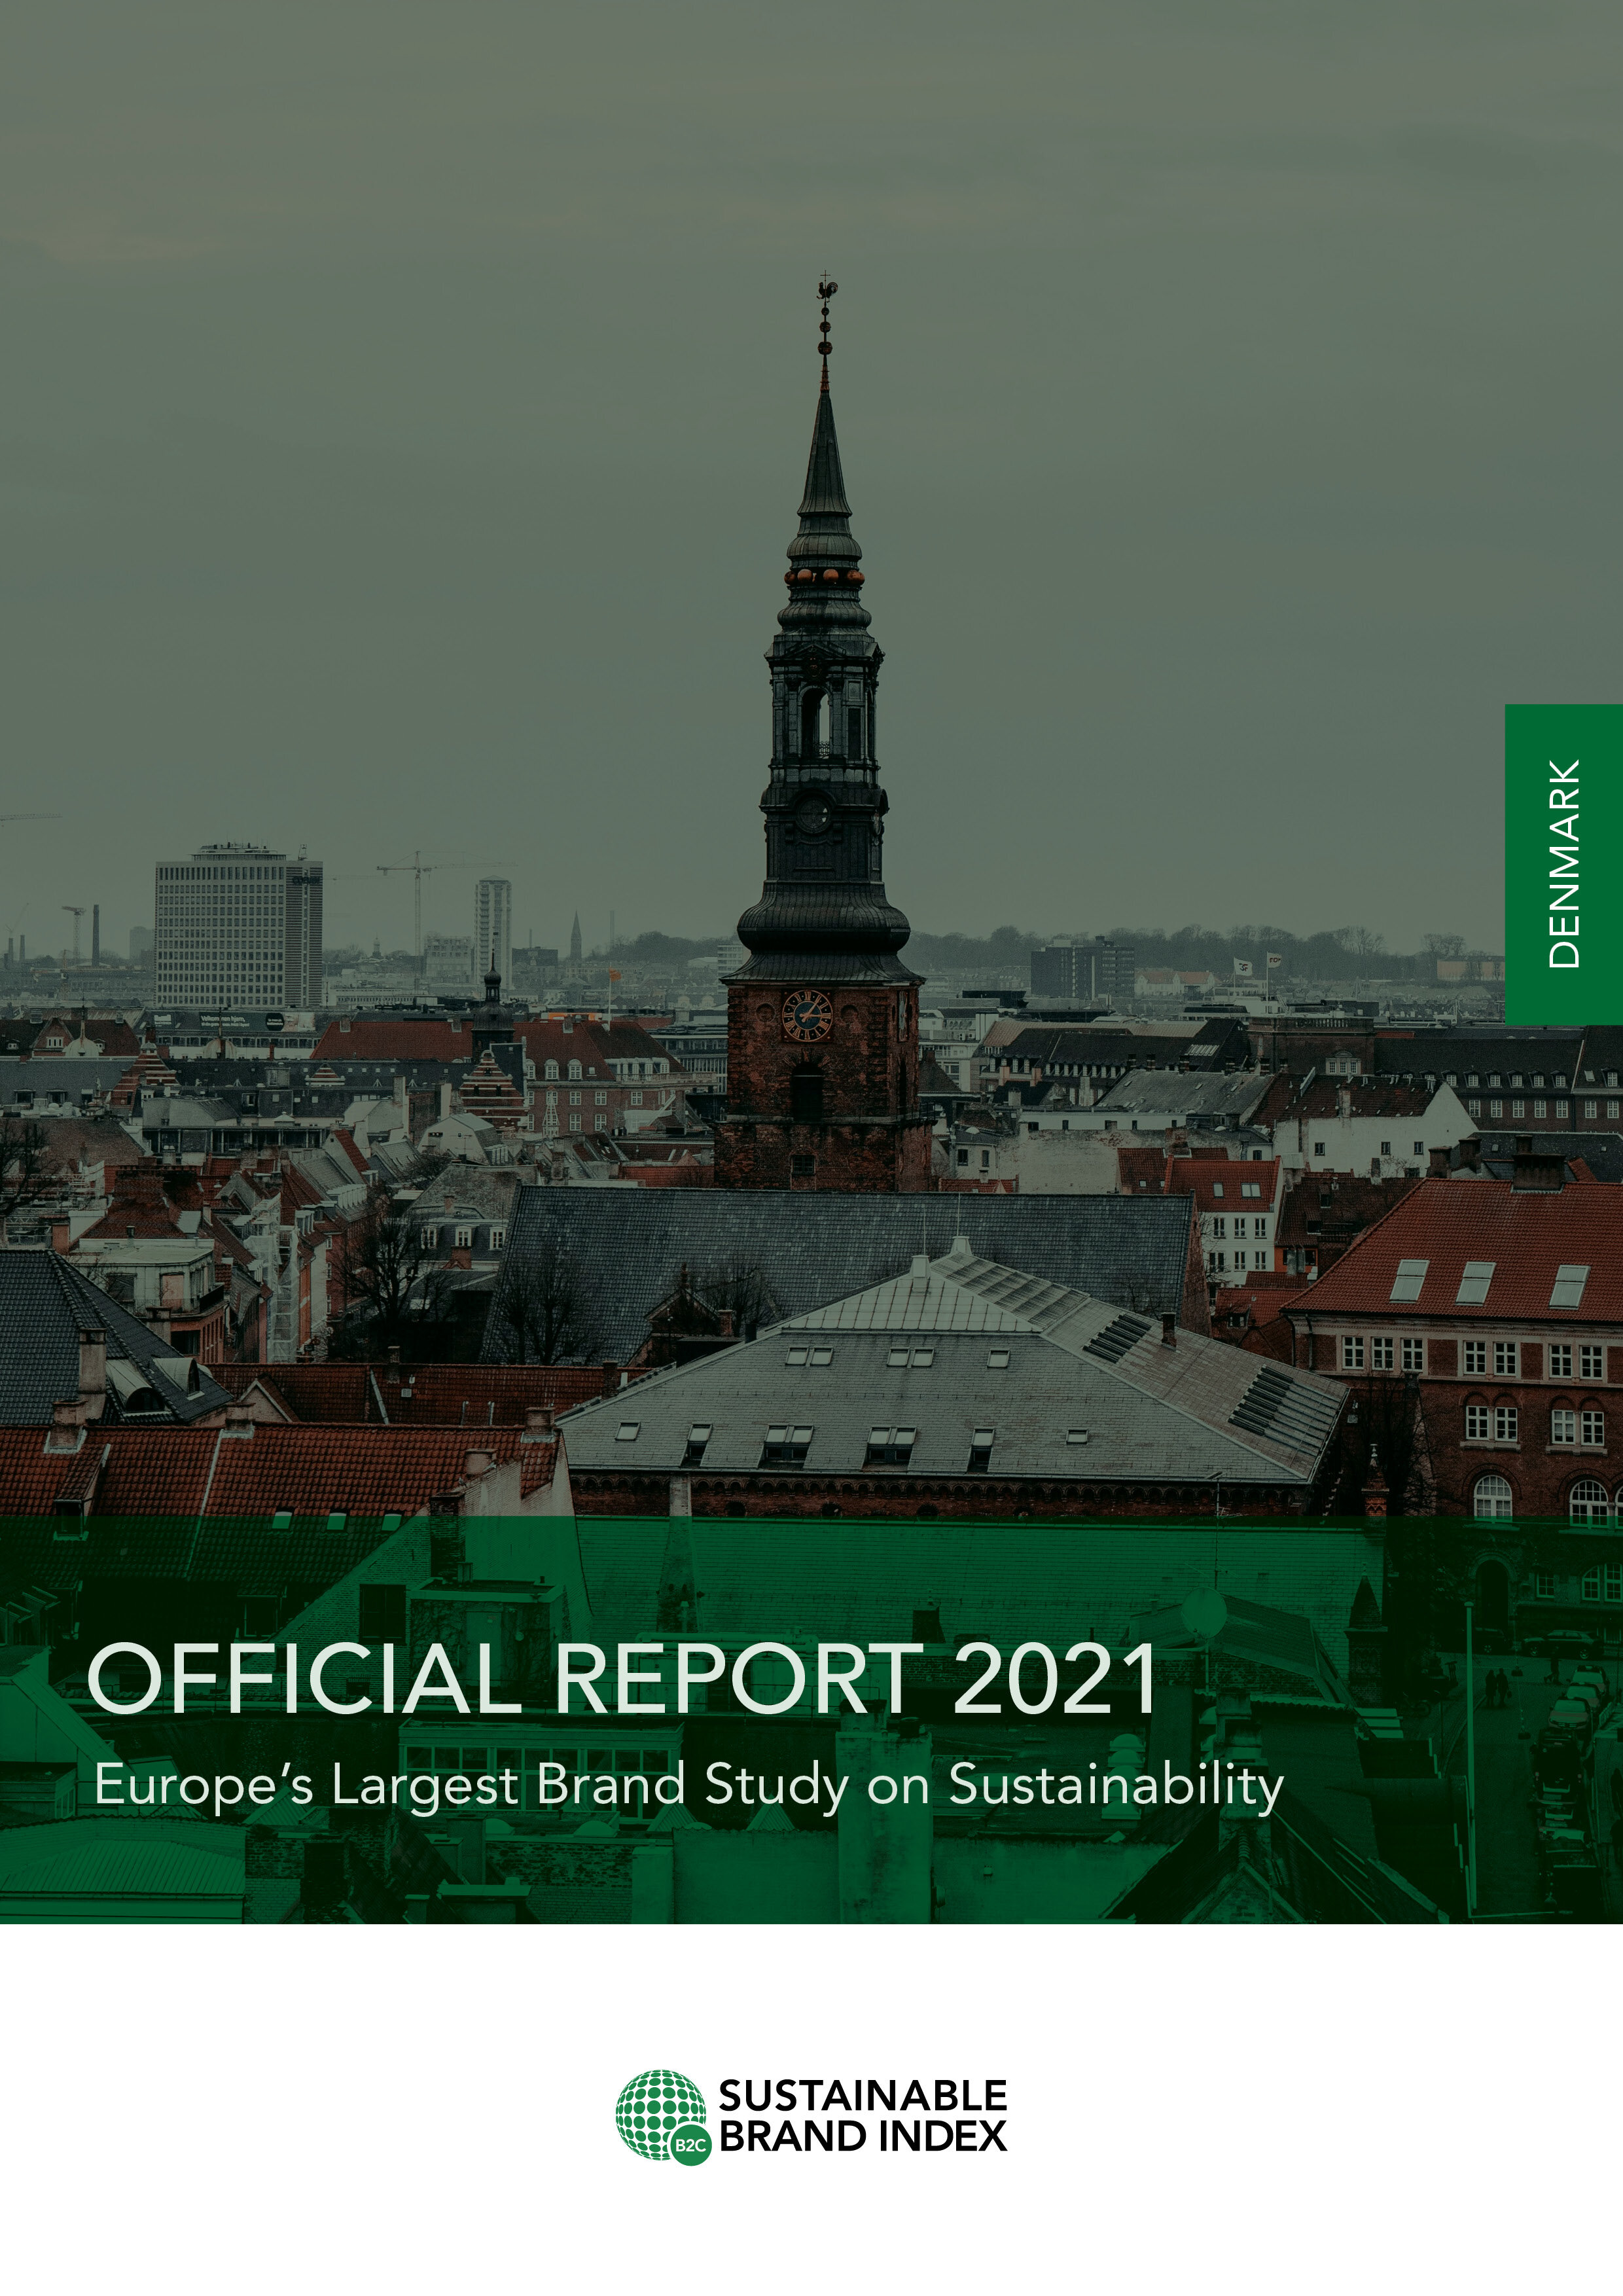 DK_Official Report_2021 LR.jpg